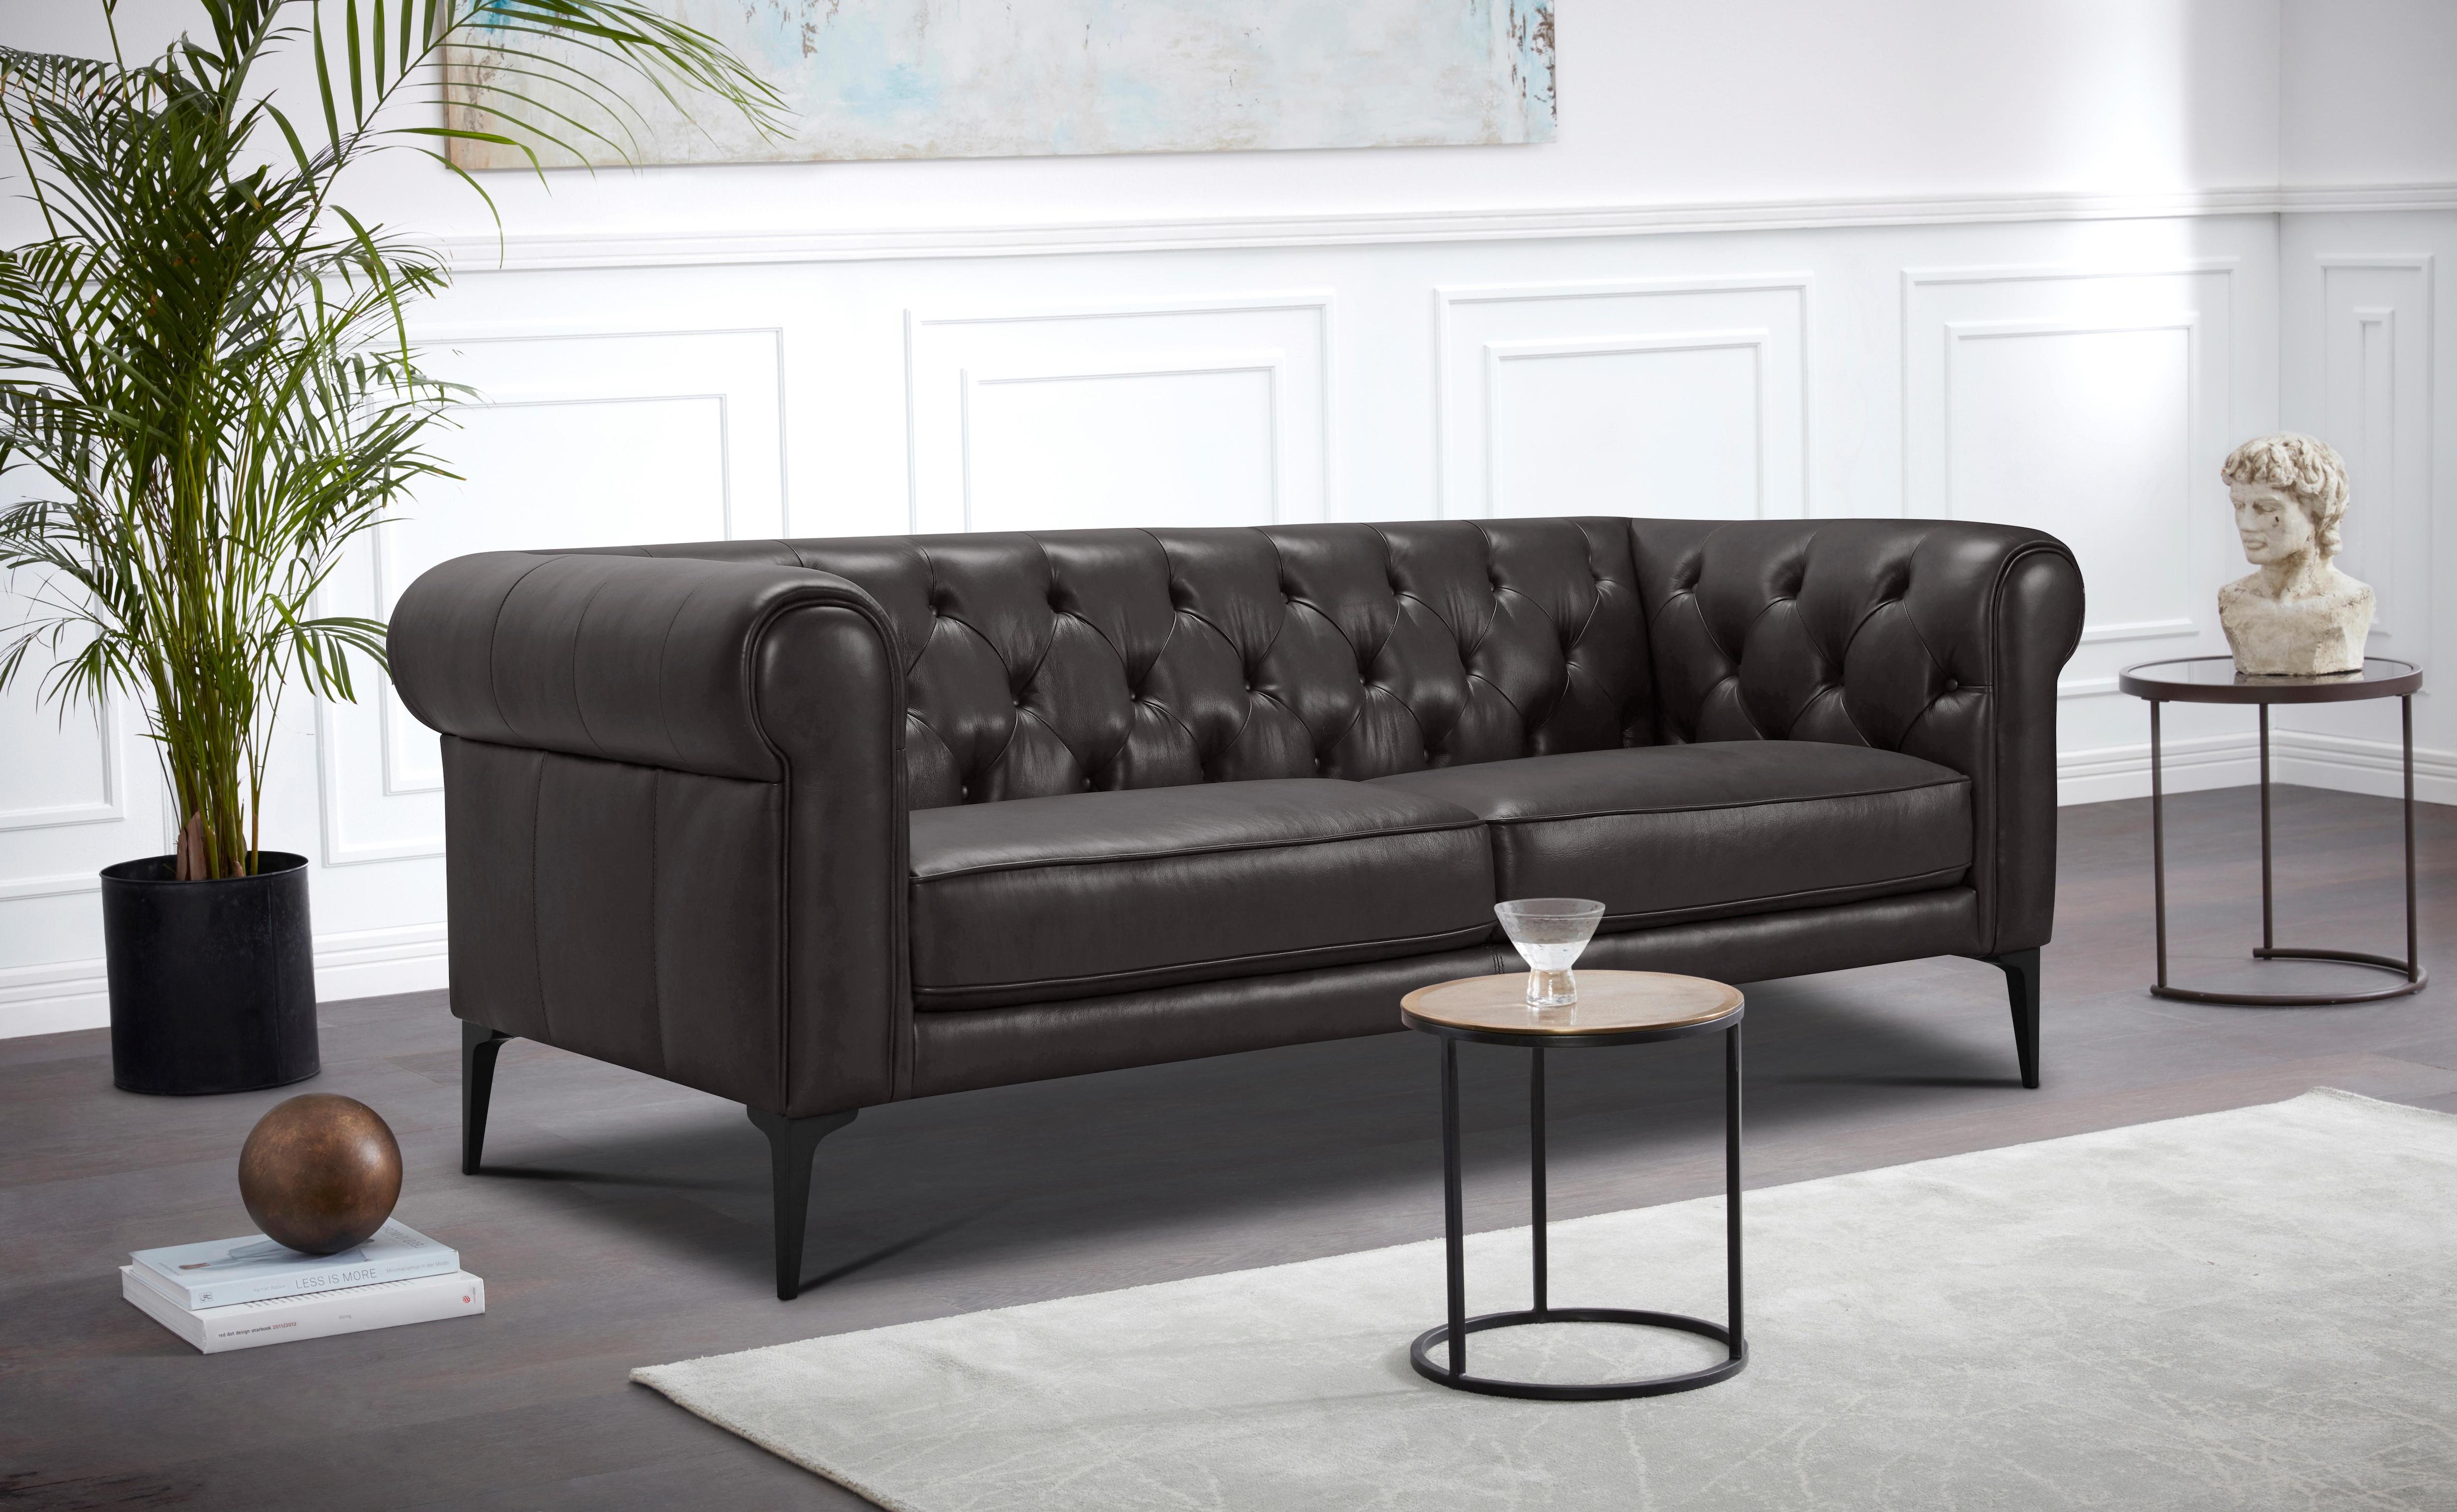 7f3277cc260b86 Premium-Collection-By-Home-Affaire 2   3 Sitzer Sofas online kaufen ...